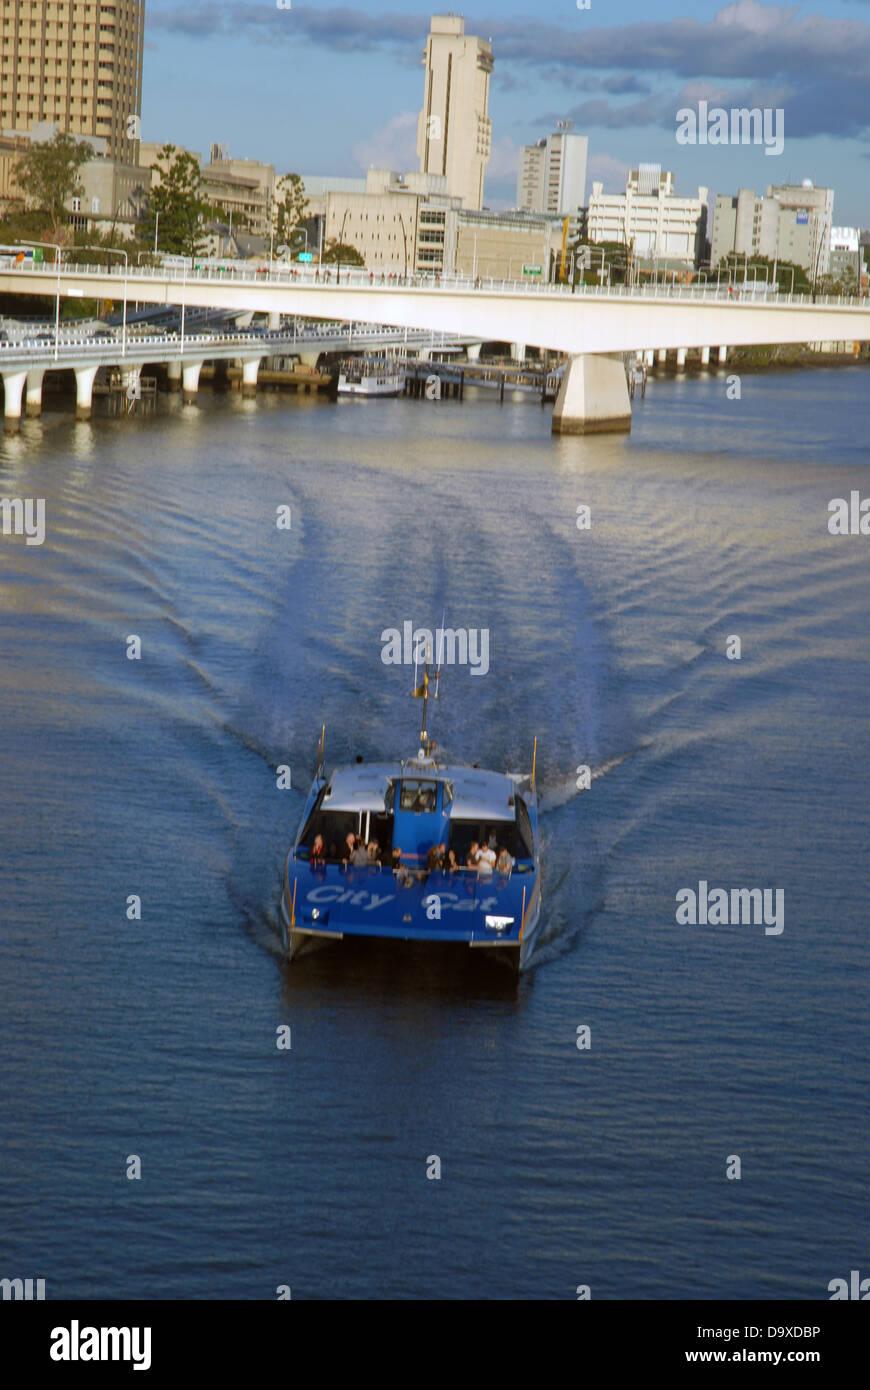 City Cat, Brisbane River, Brisbane, Queensland, Australia. - Stock Image